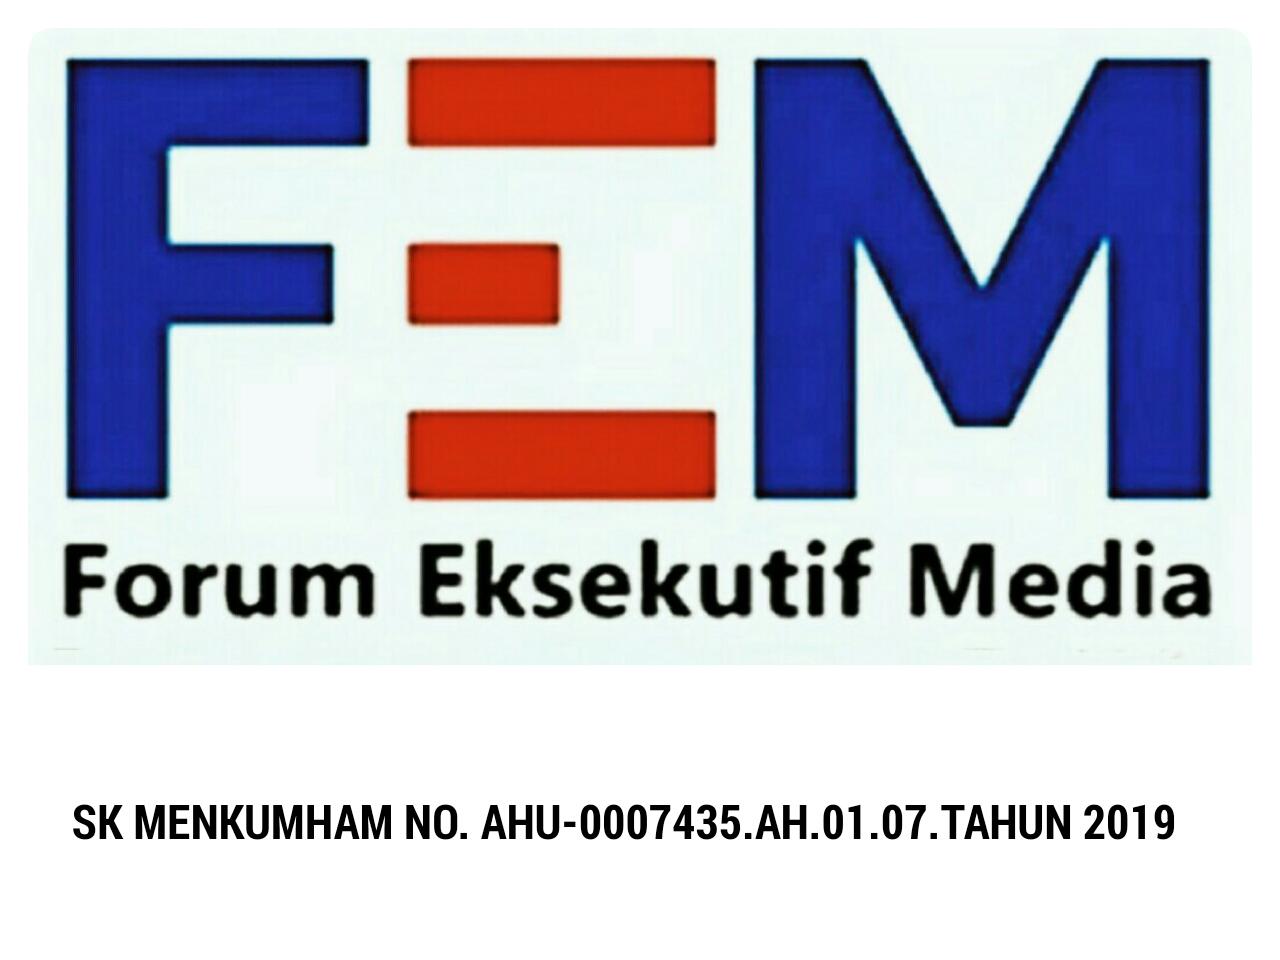 FEM Dukung Pemberian Perlindungan dan Jaminan Keselamatan Terhadap Jurnalis